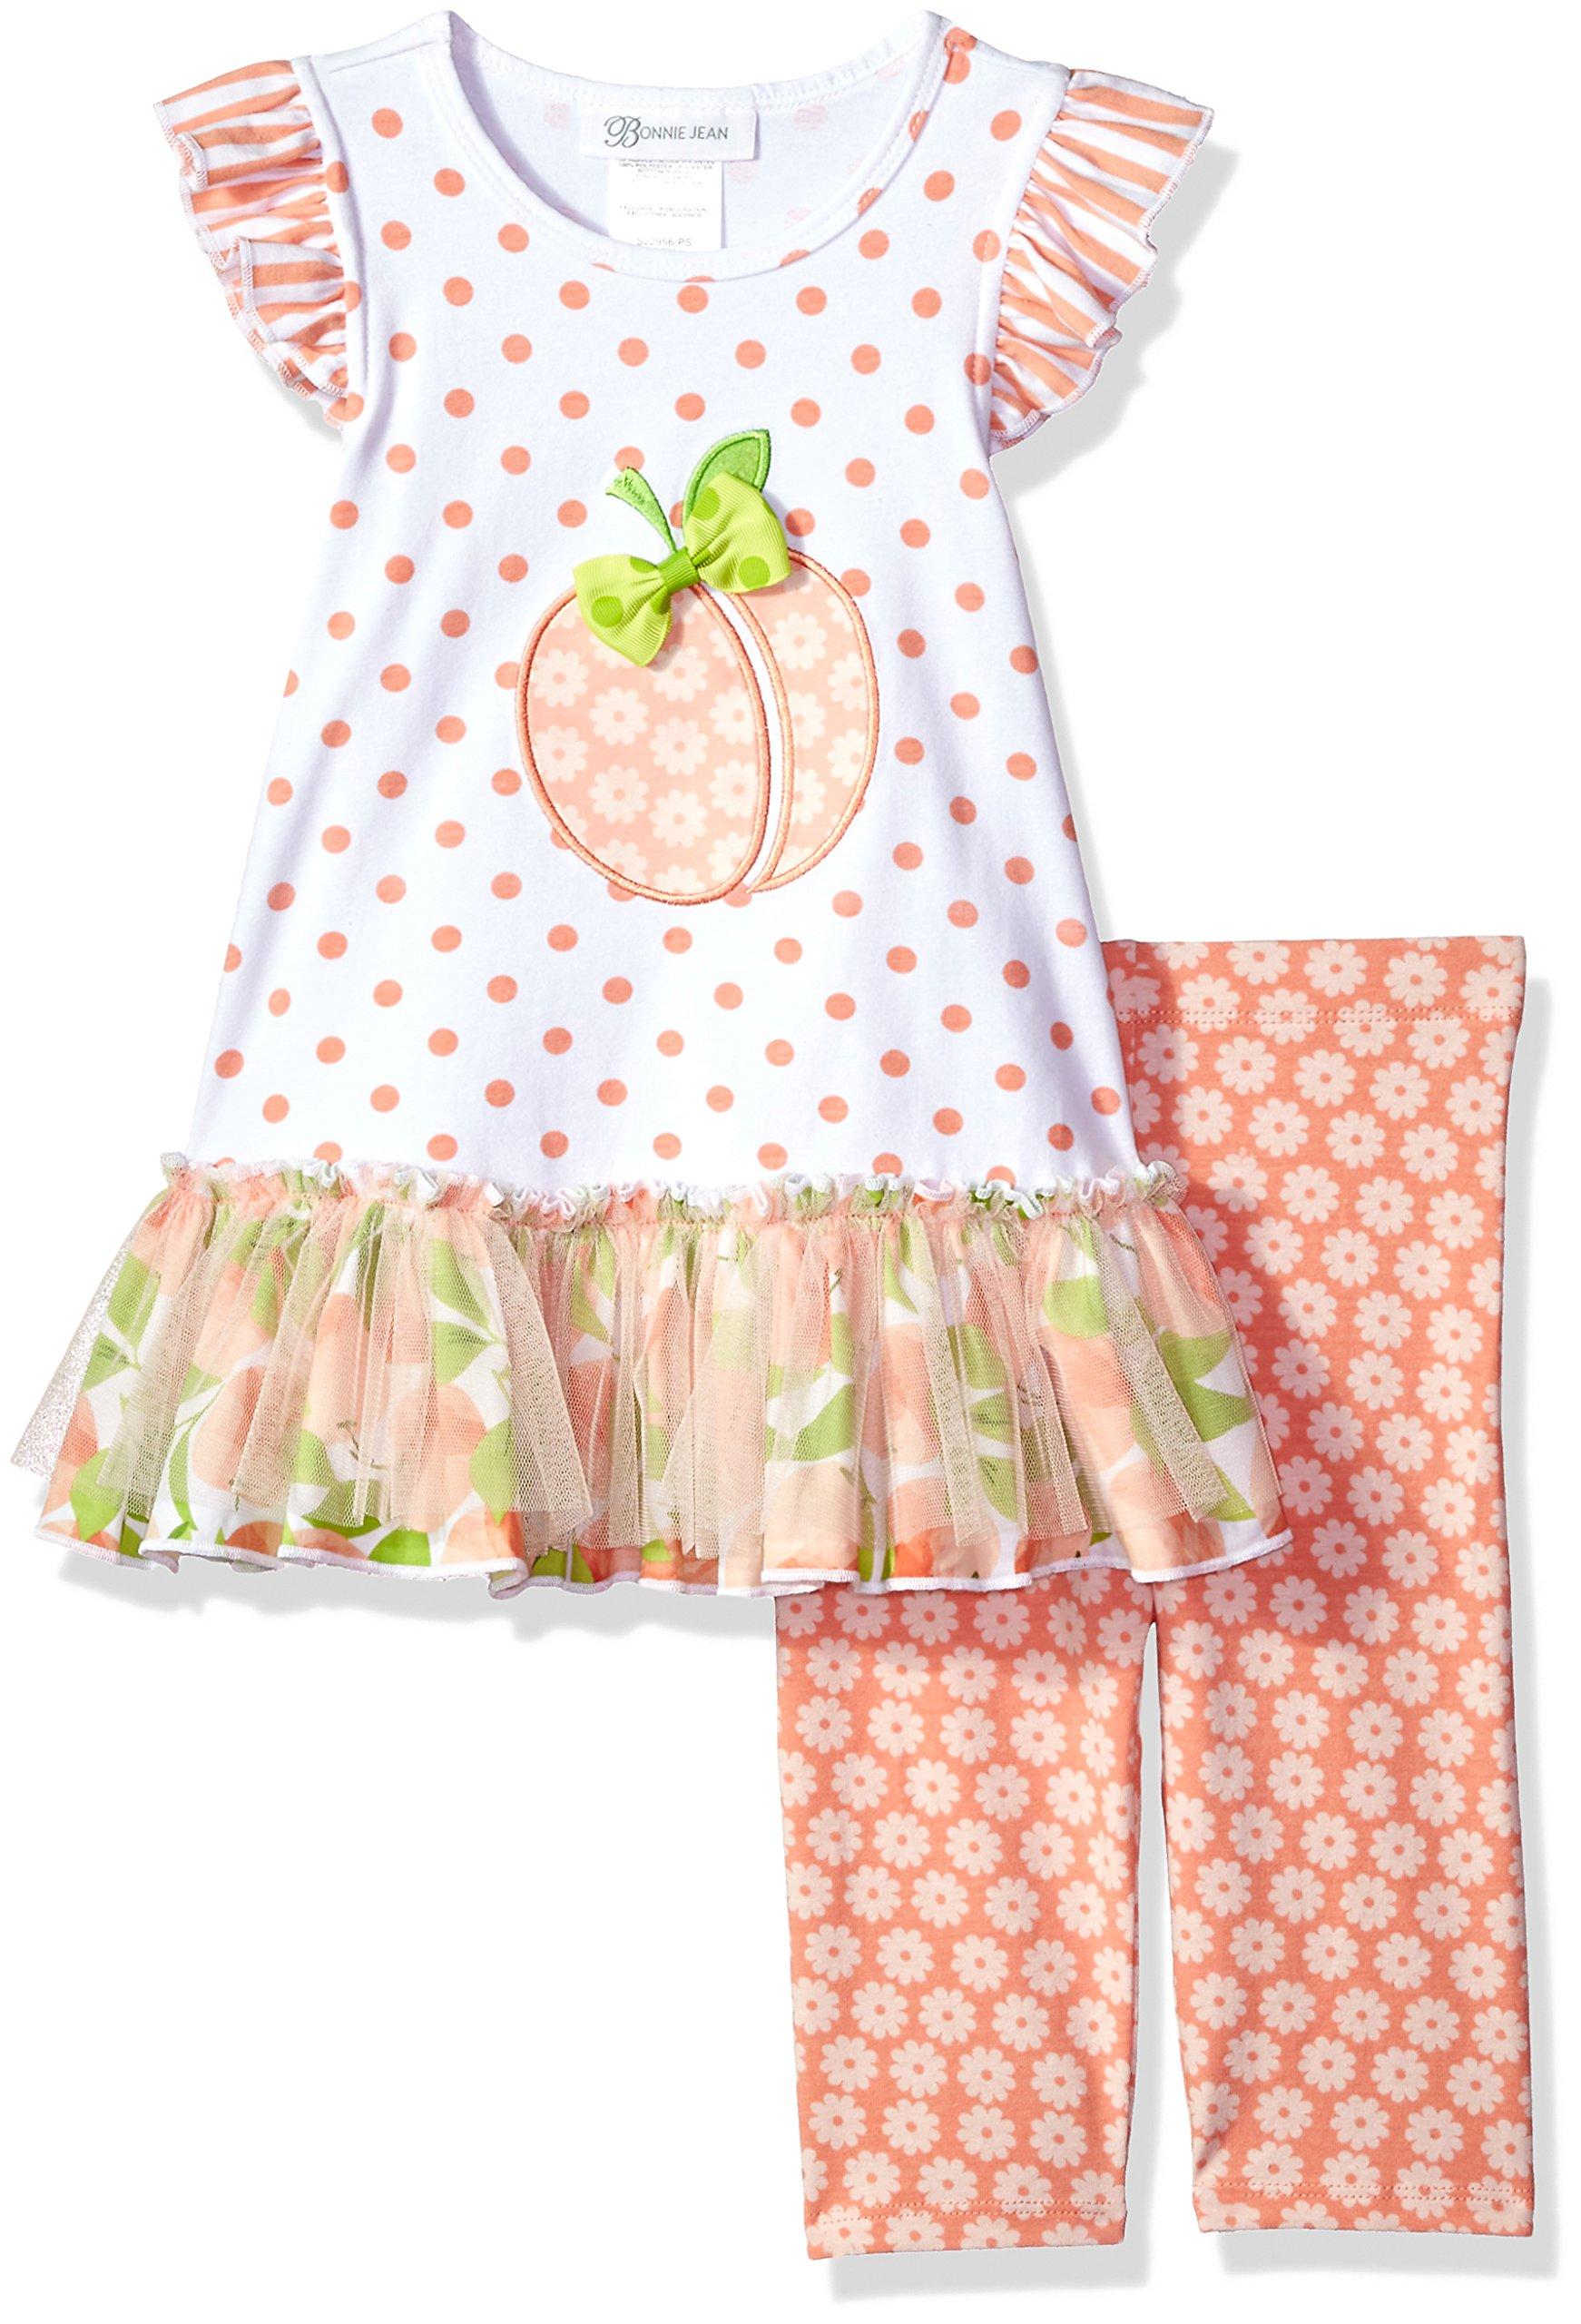 Bonnie Jean Little Girls' Appliqued Dress and Legging Set, Peach, 4 by Bonnie Jean (Image #1)